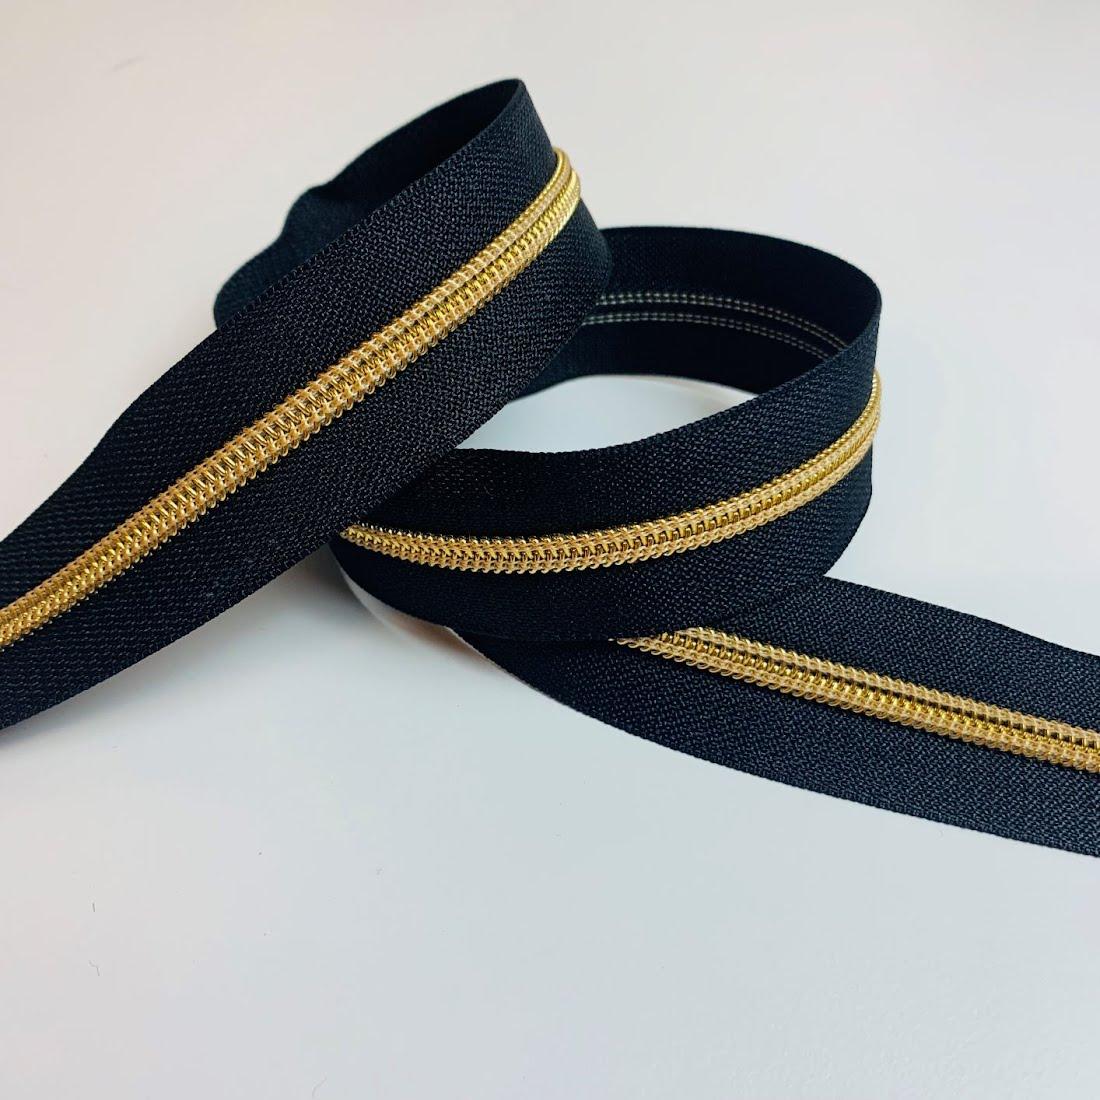 Metallisierter Reissverschluss - Meras 6mm Reissverschluss / Schwarz - Gold